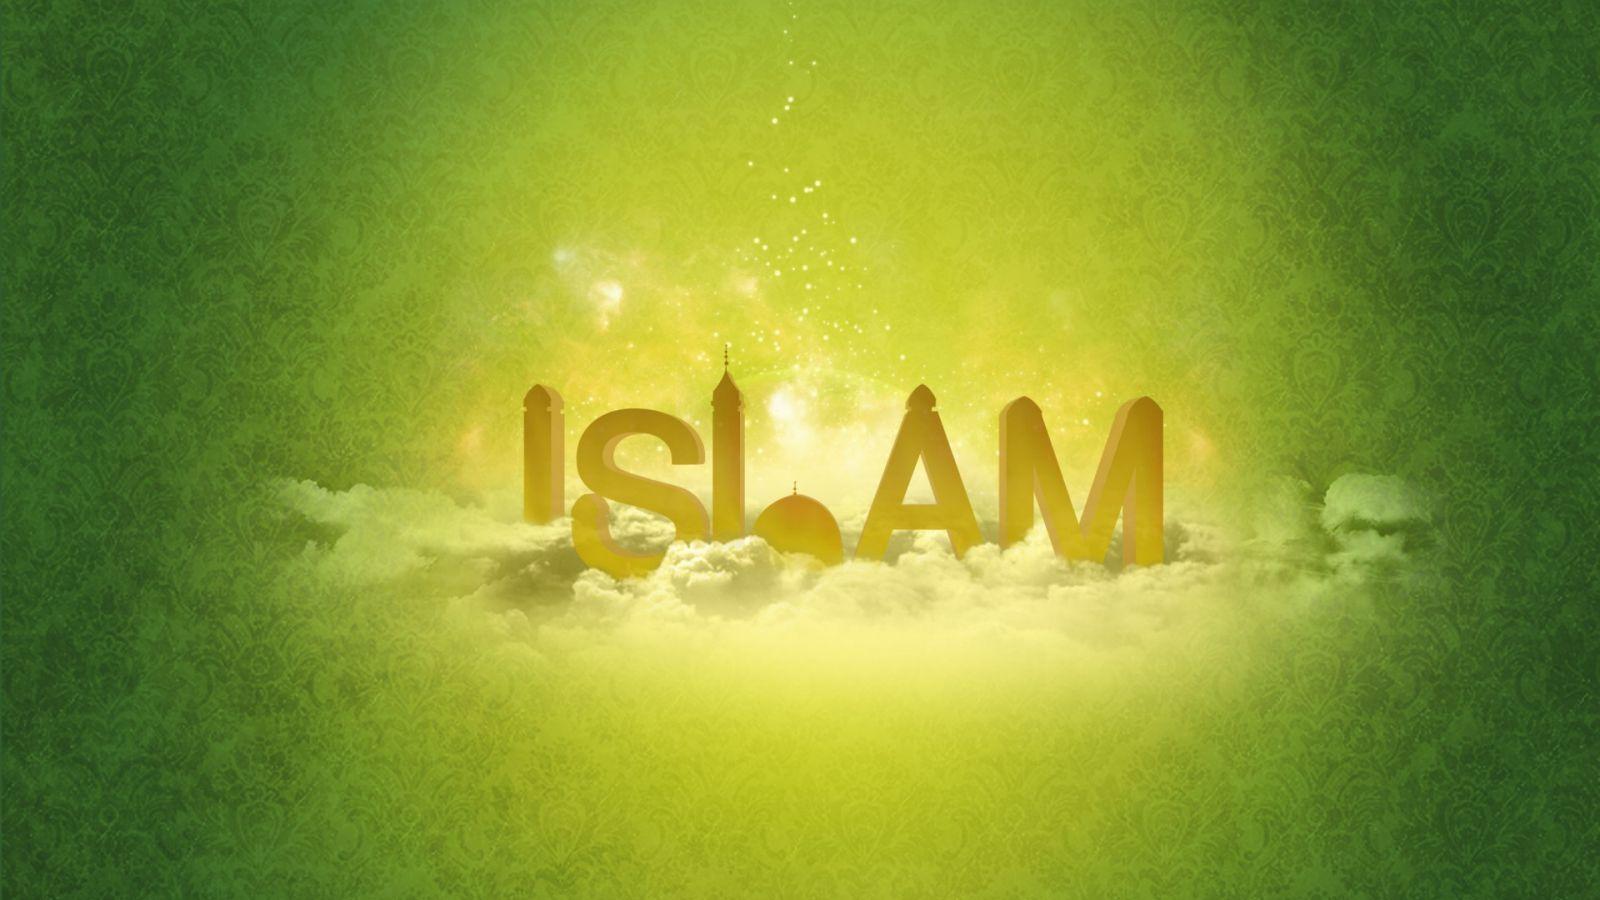 Dont Panic Im Islamic Introduction to Islam 1600x900